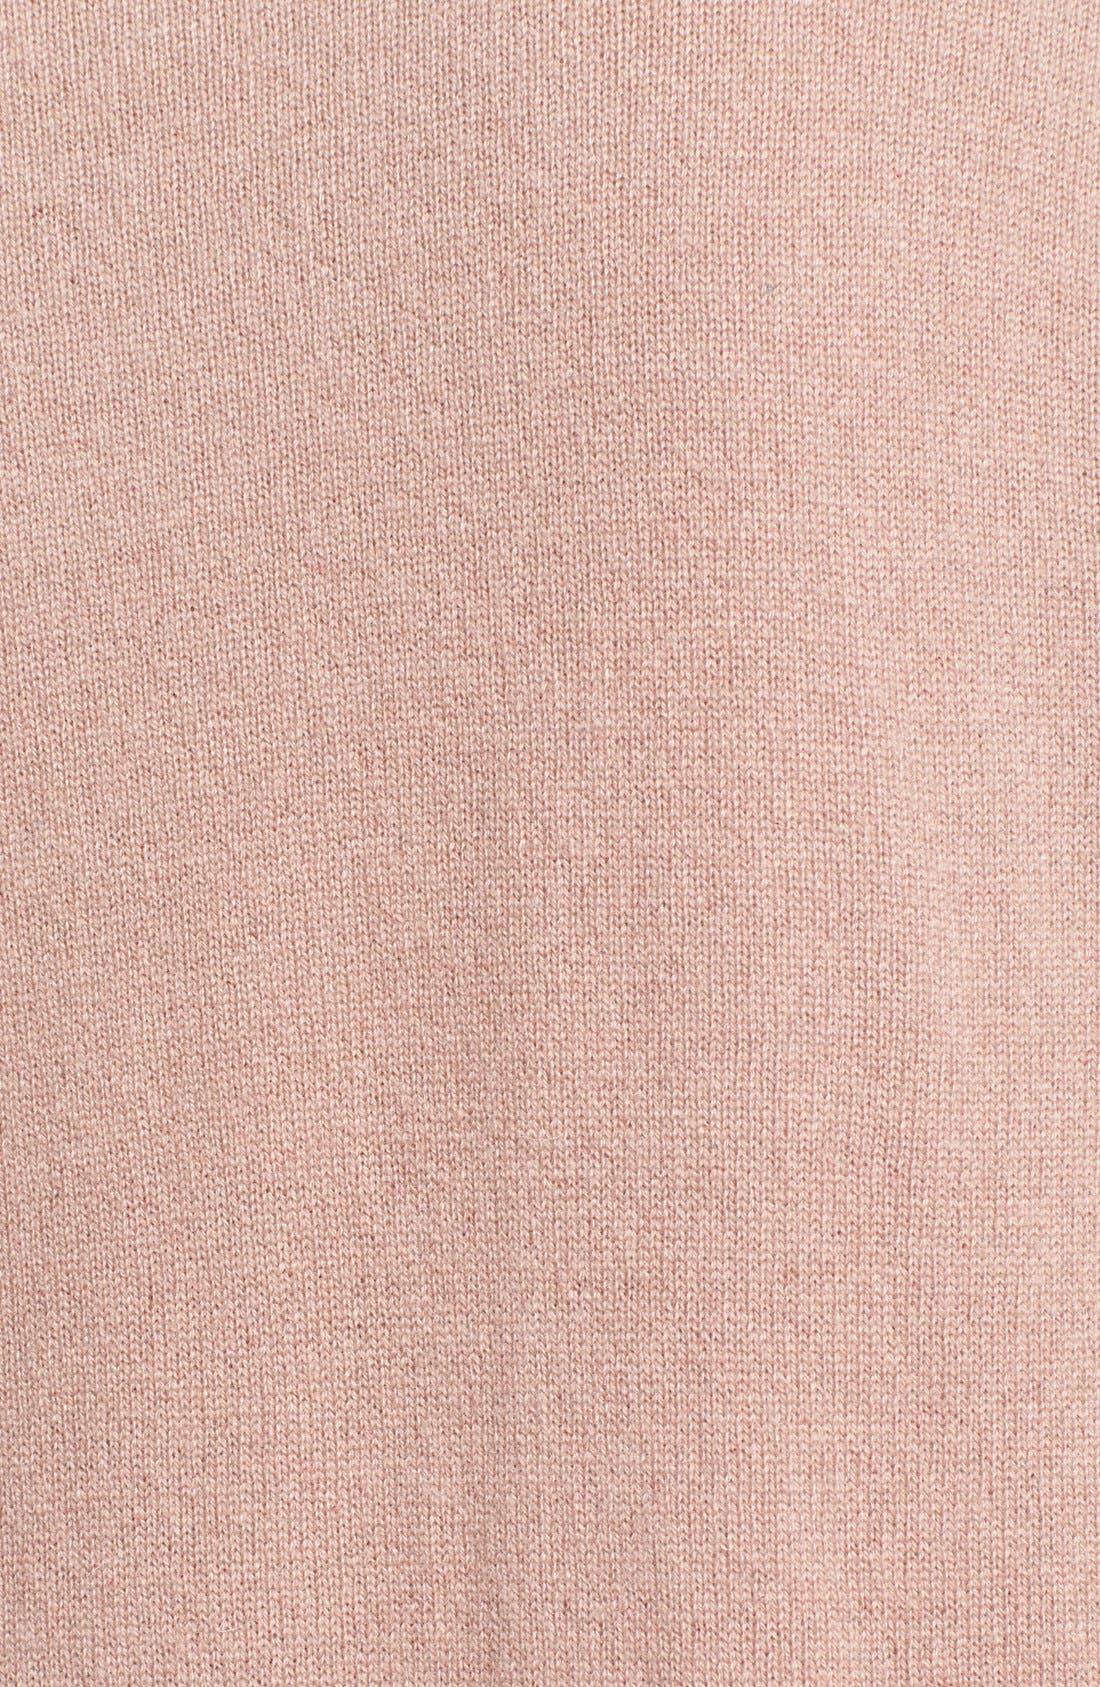 Alternate Image 3  - Equipment 'Rei' Cashmere Sweater